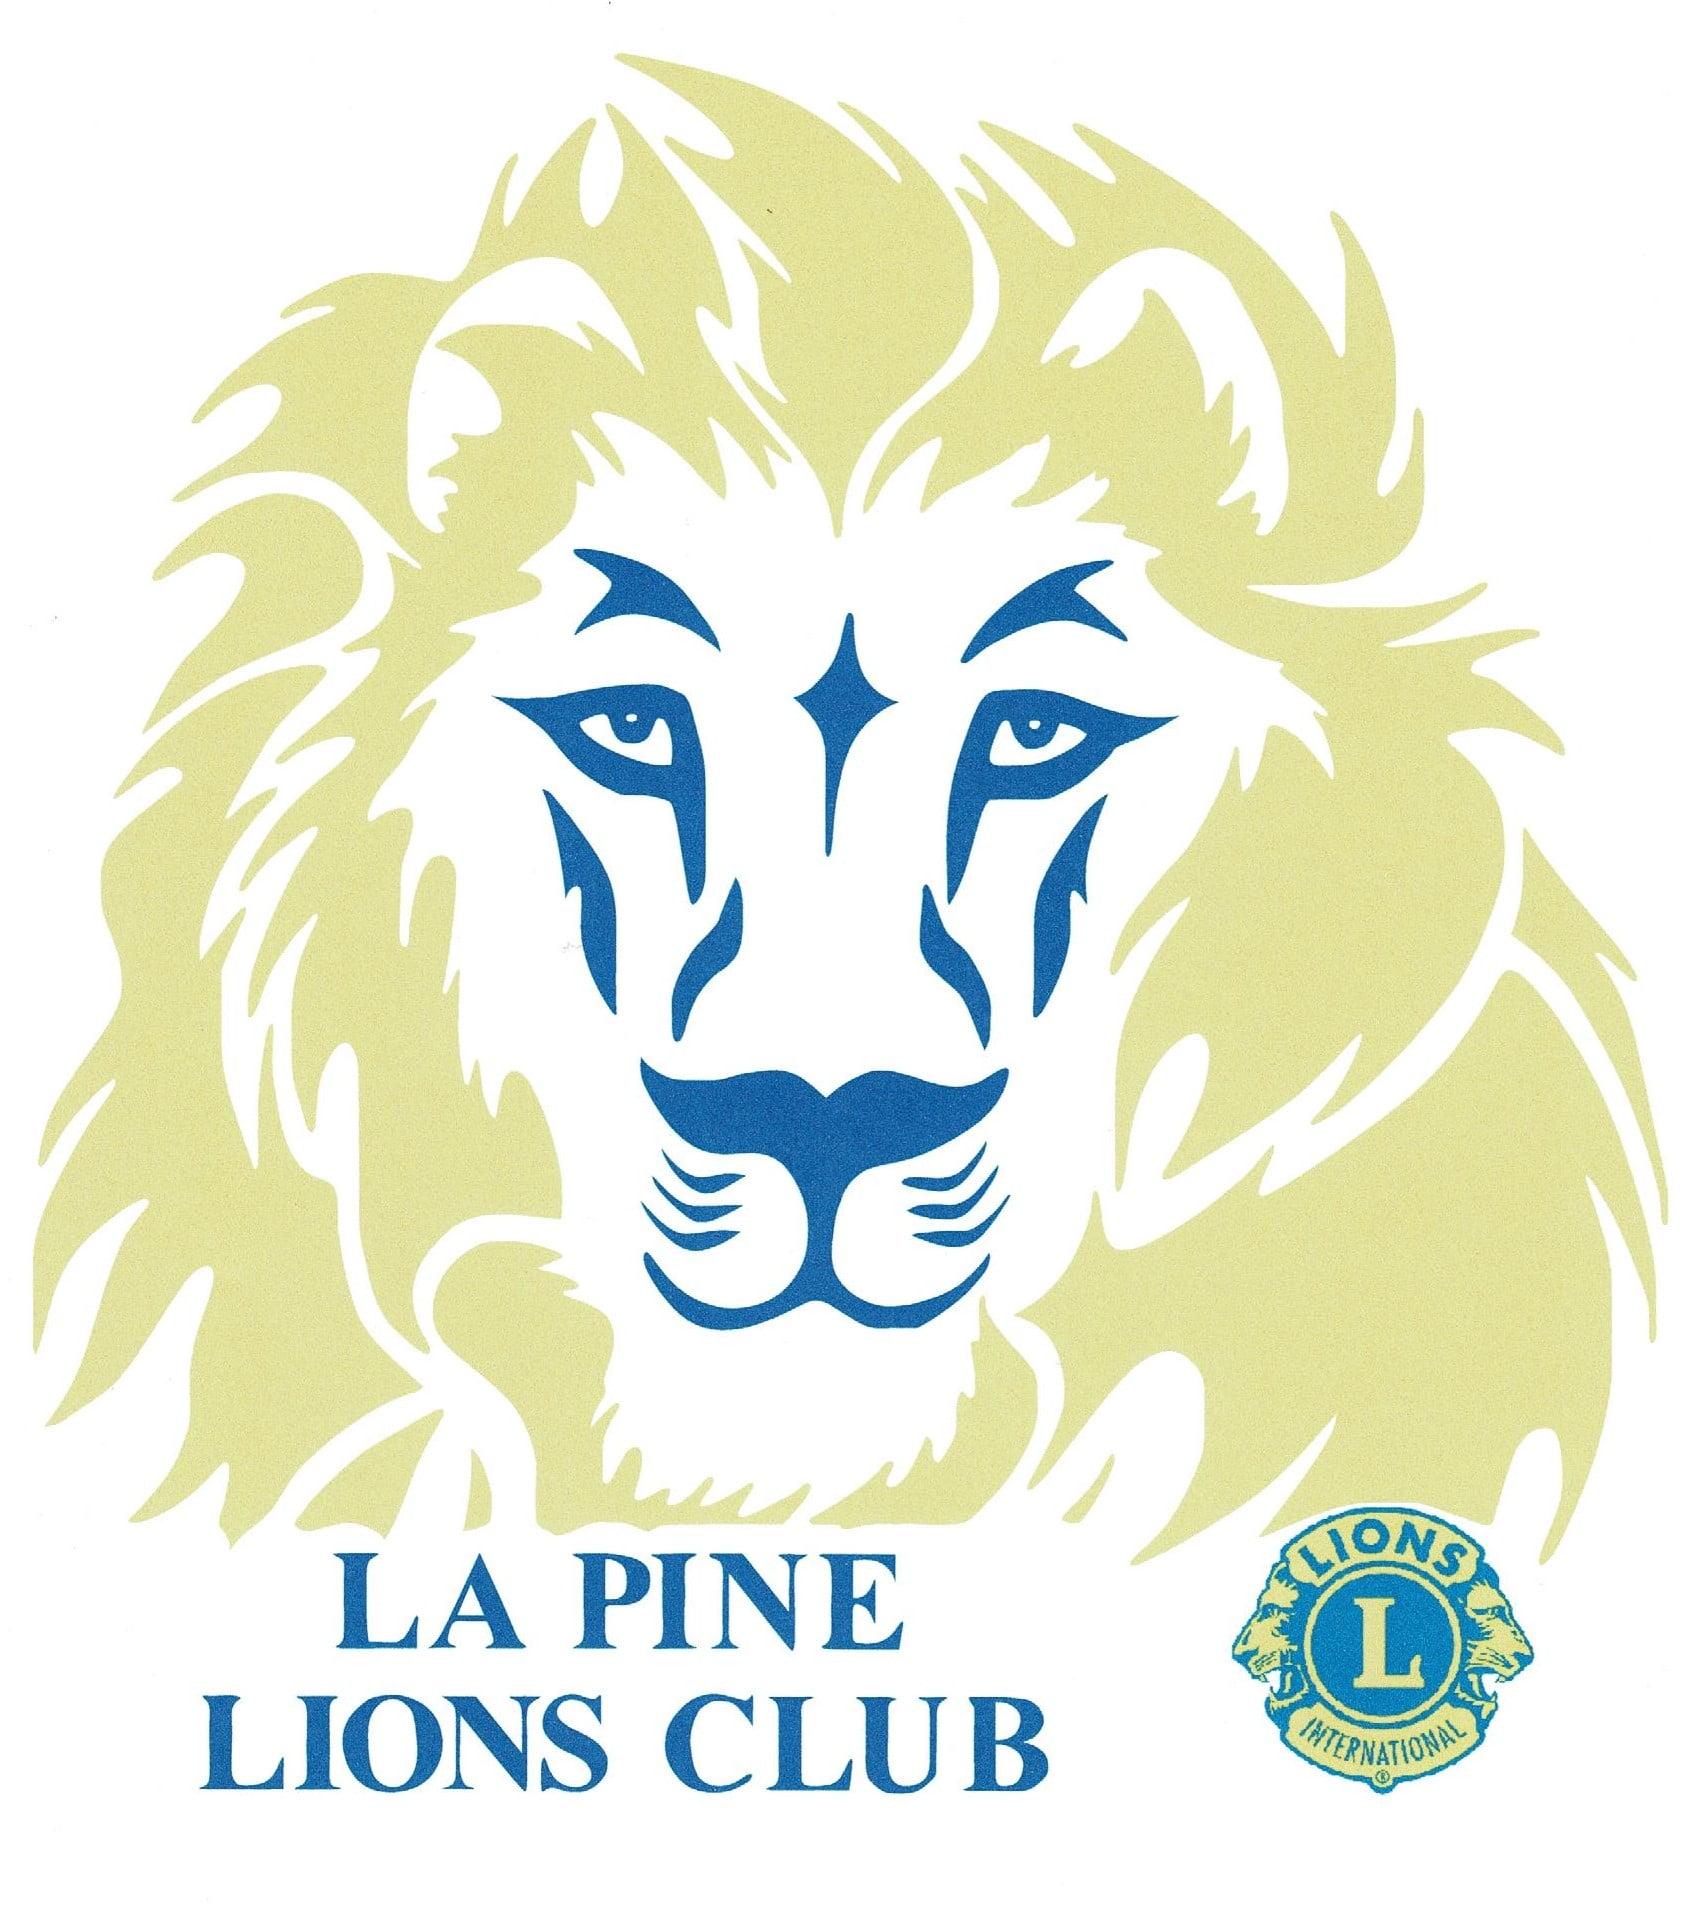 La Pine Lions Club